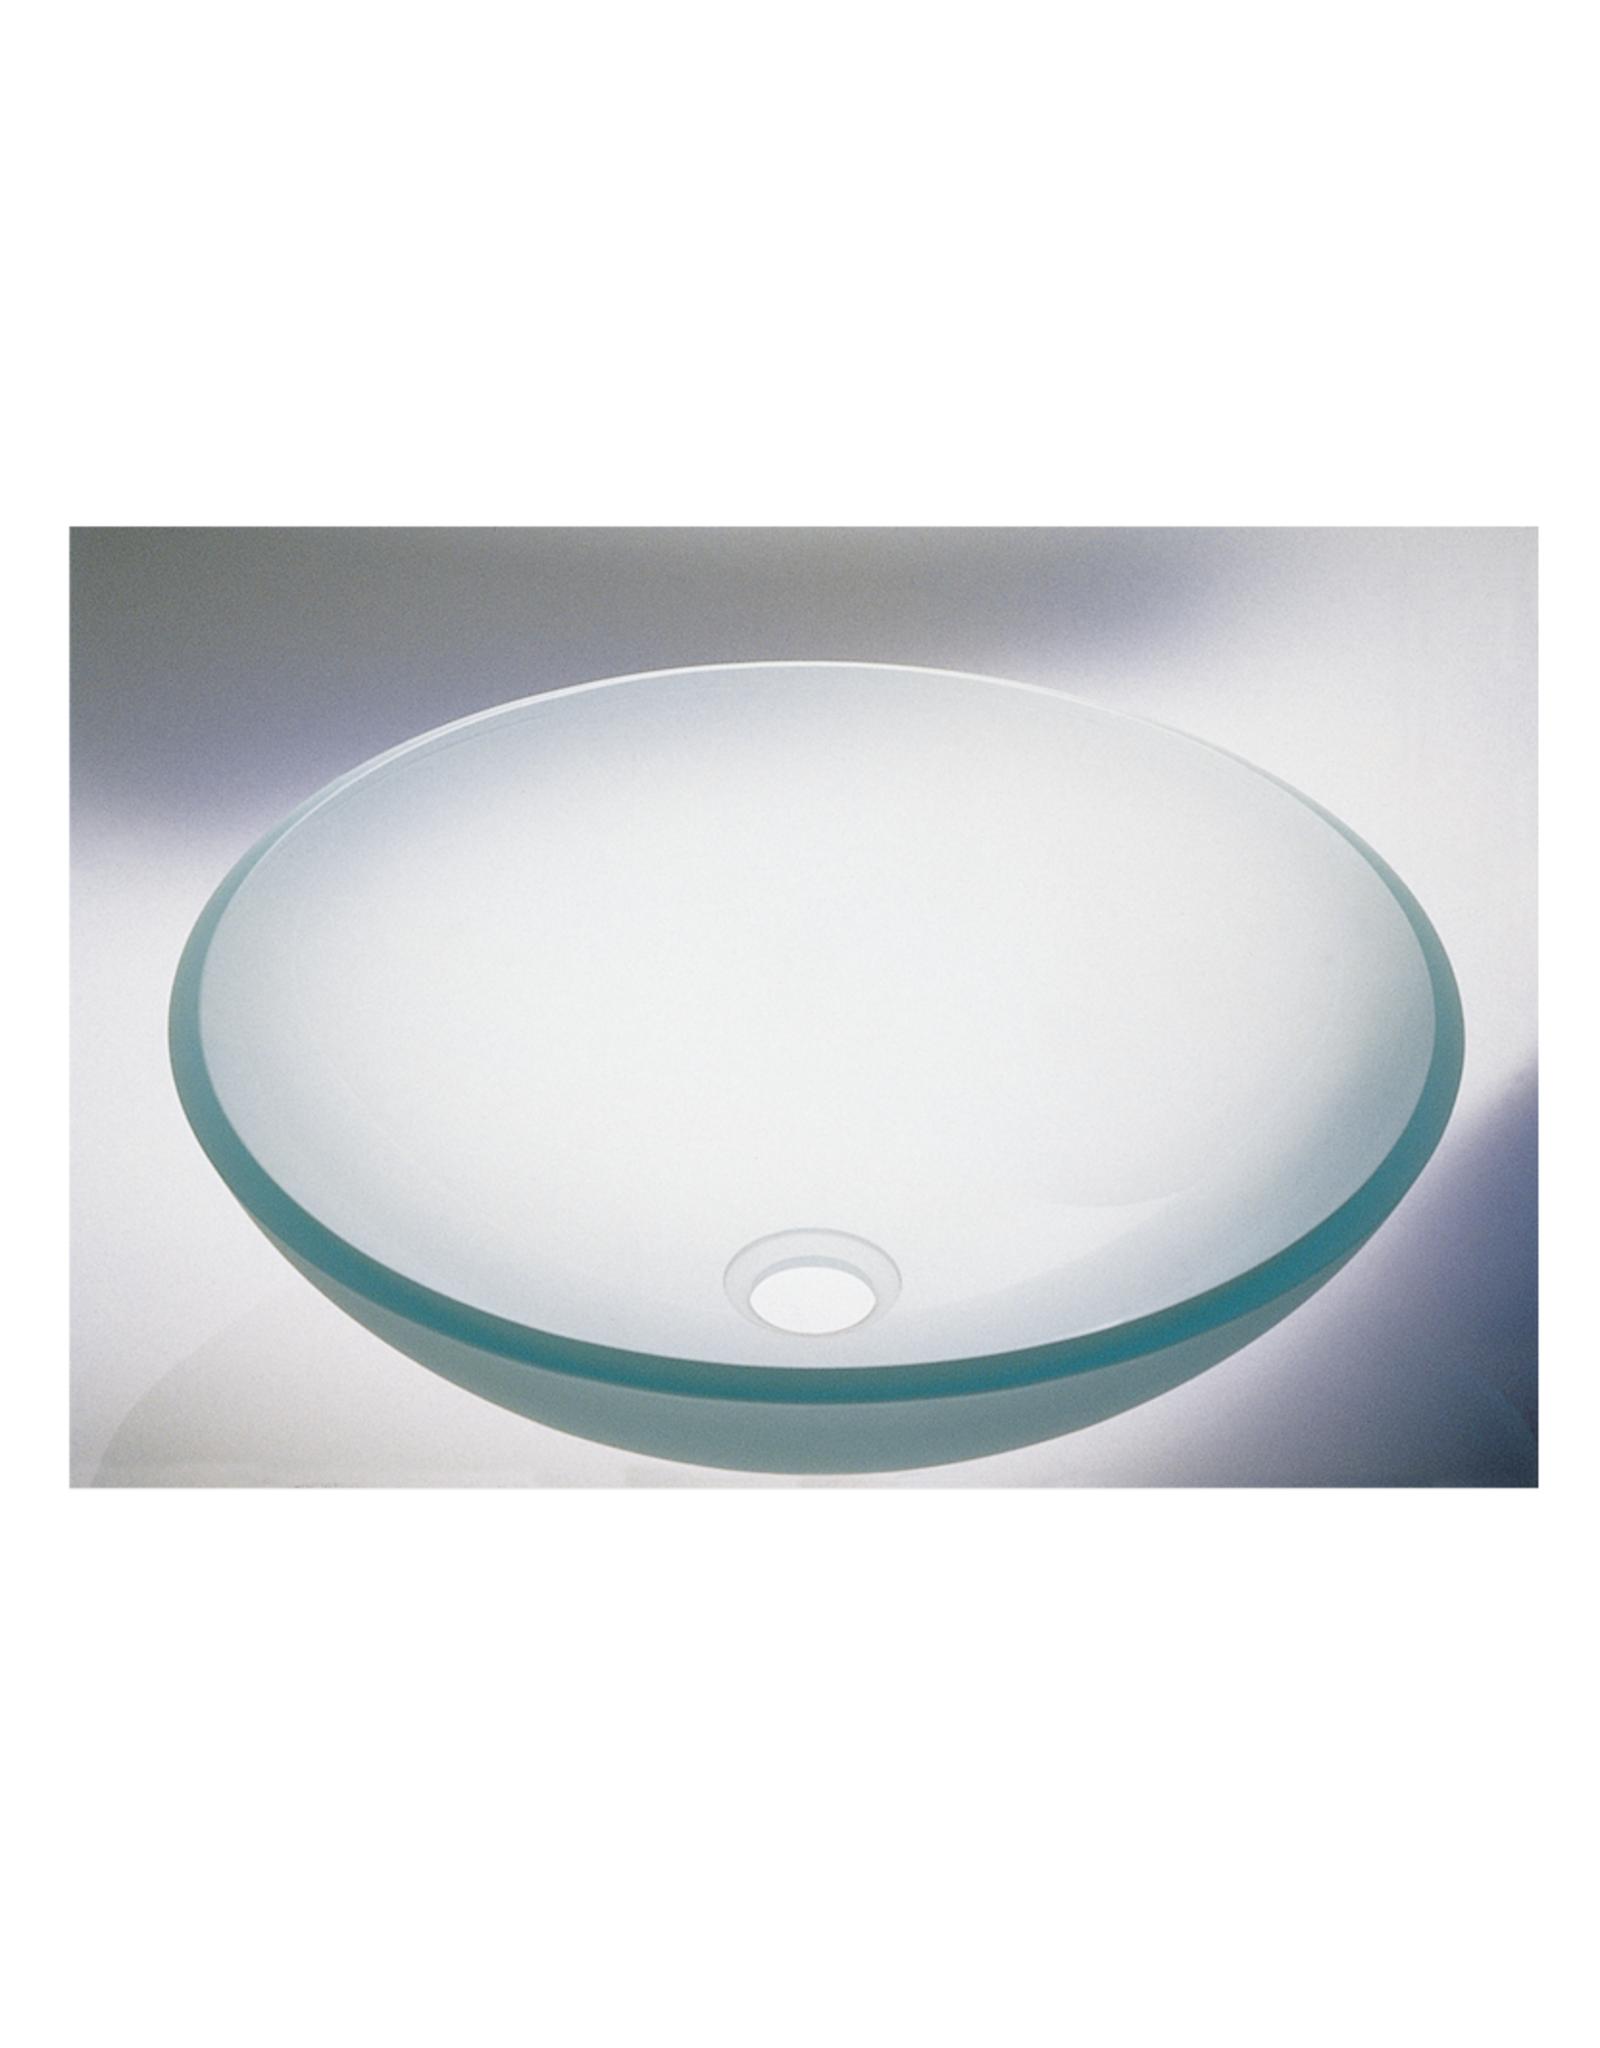 HighTech Pollux vasque lave-mains - vente